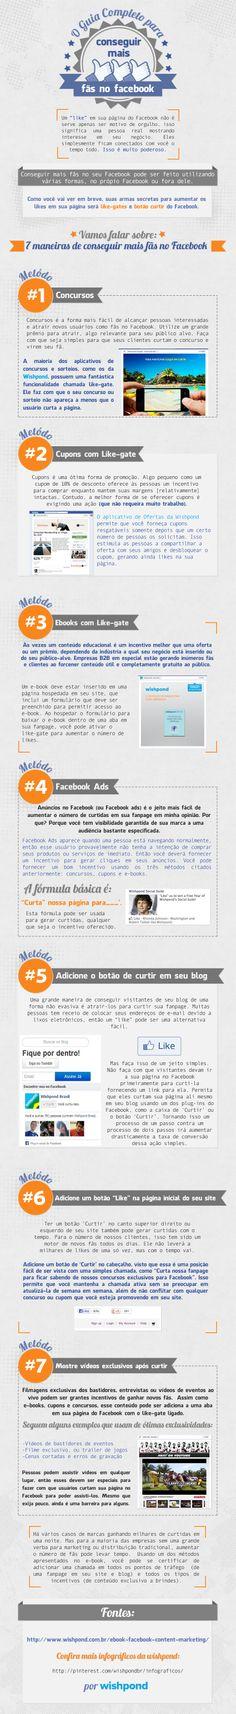 Facebook, Marketing Digital, Business, Design, Social Networks, Advertising, Socialism, Entrepreneurship, Glass Display Case